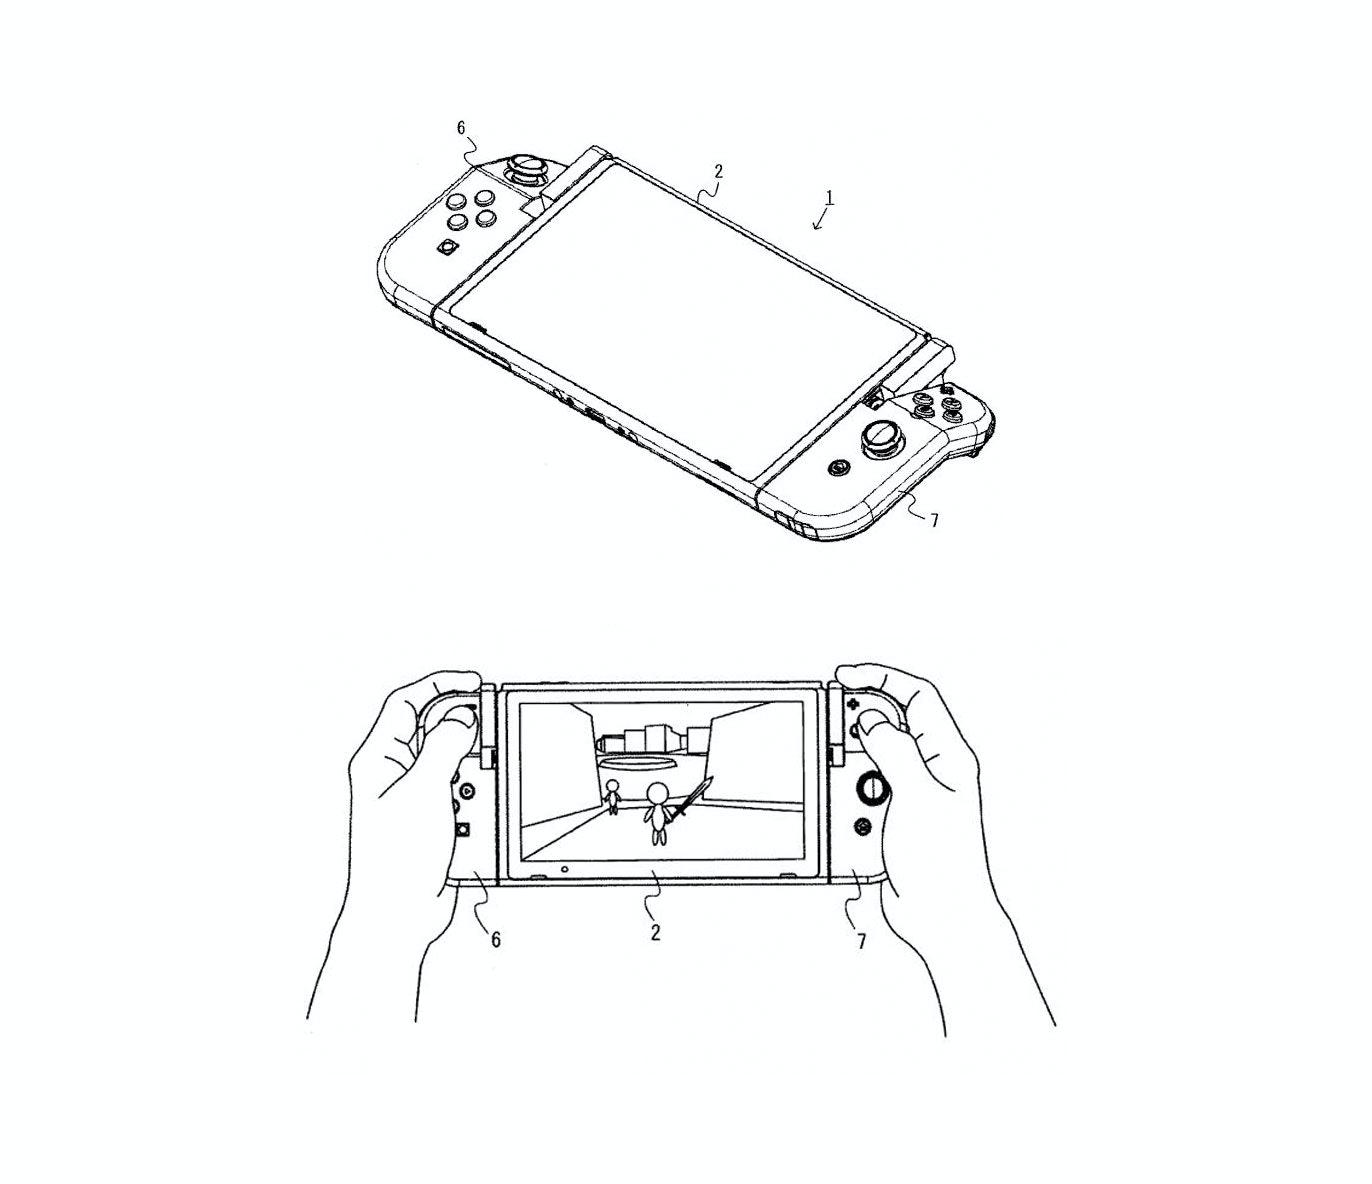 nintendo switch joy con patent